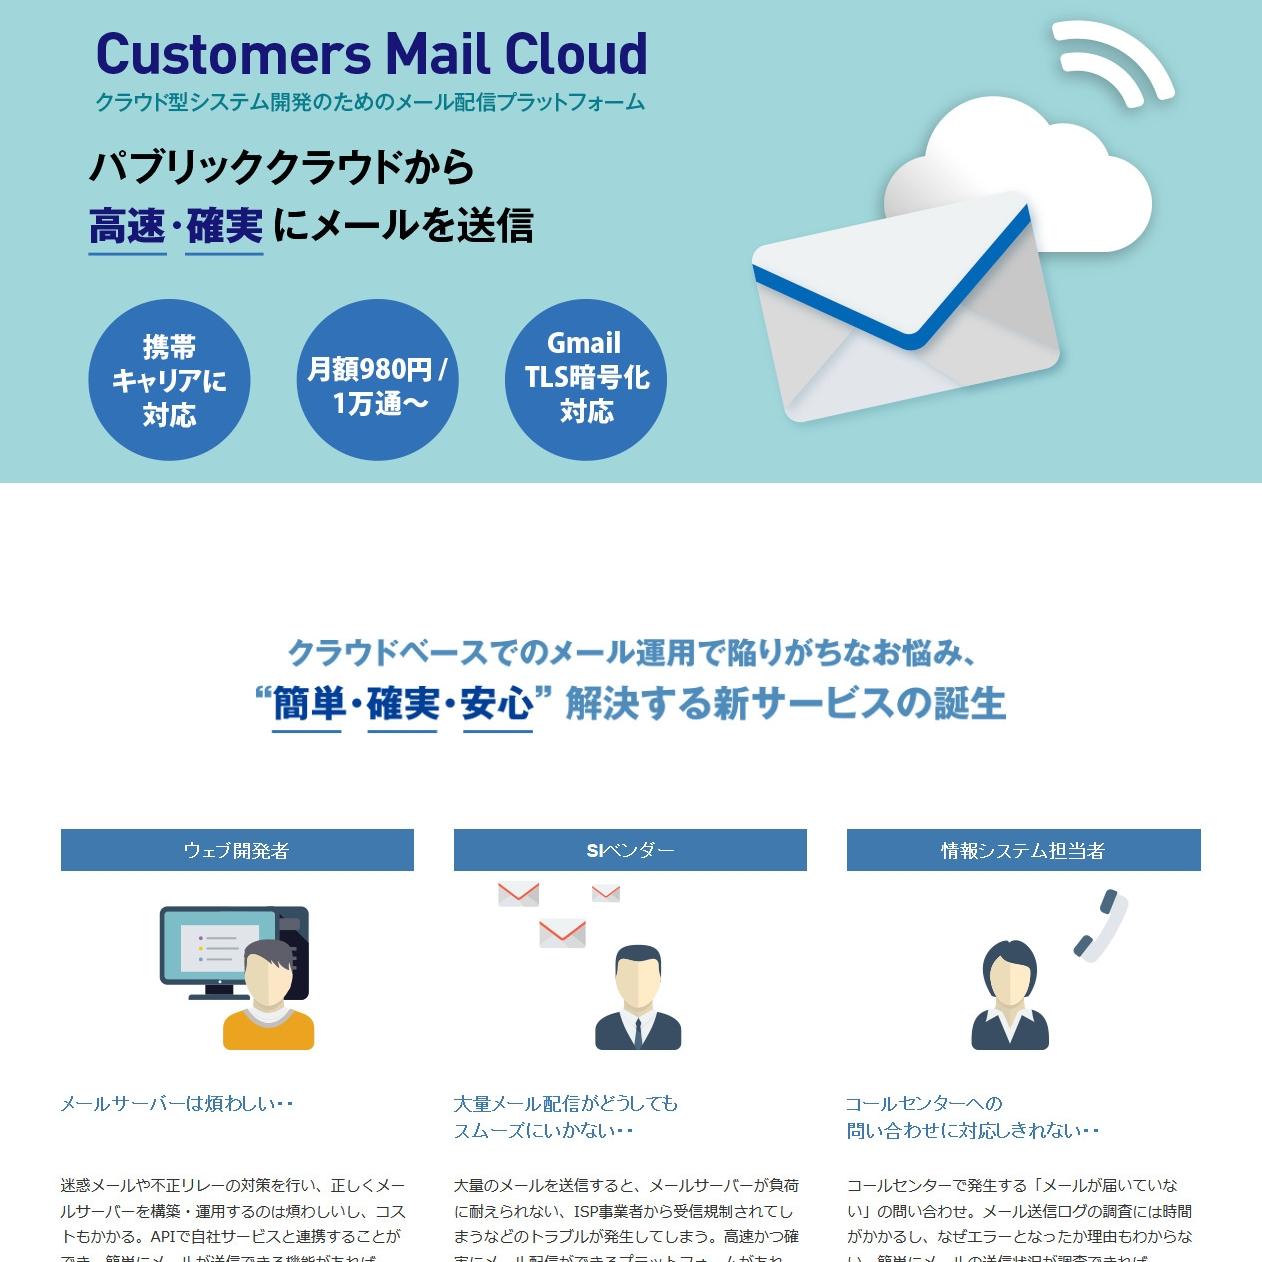 Customers Mail Cloud ランディングページ